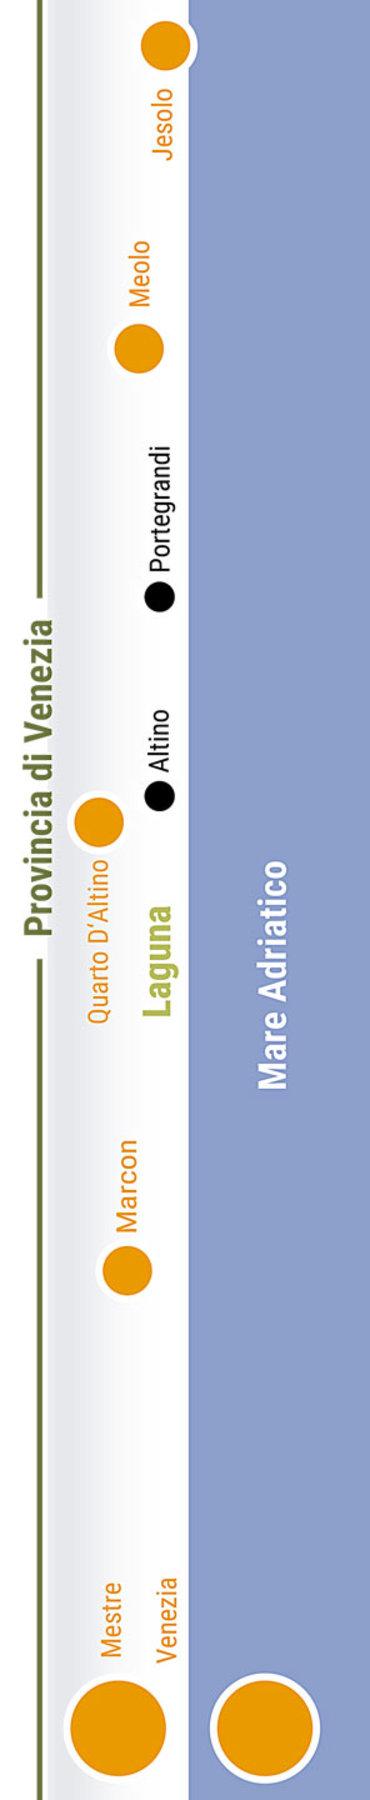 Übersichtskarte rechts Teilabschnitt 41a Laguna